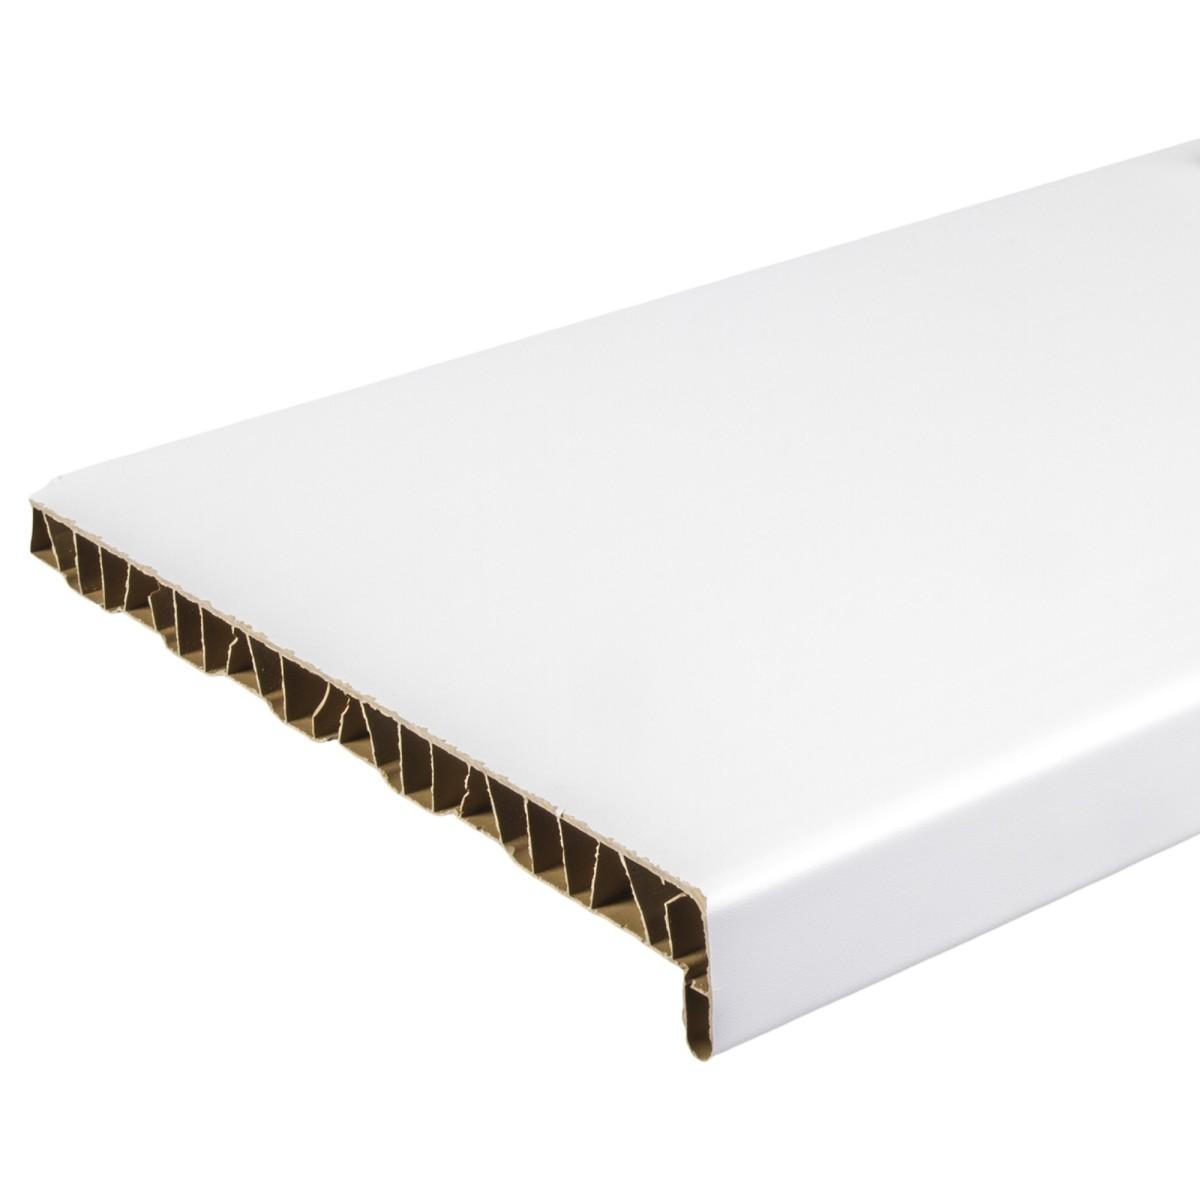 Подоконник ПВХ 300x2000 мм цвет белый